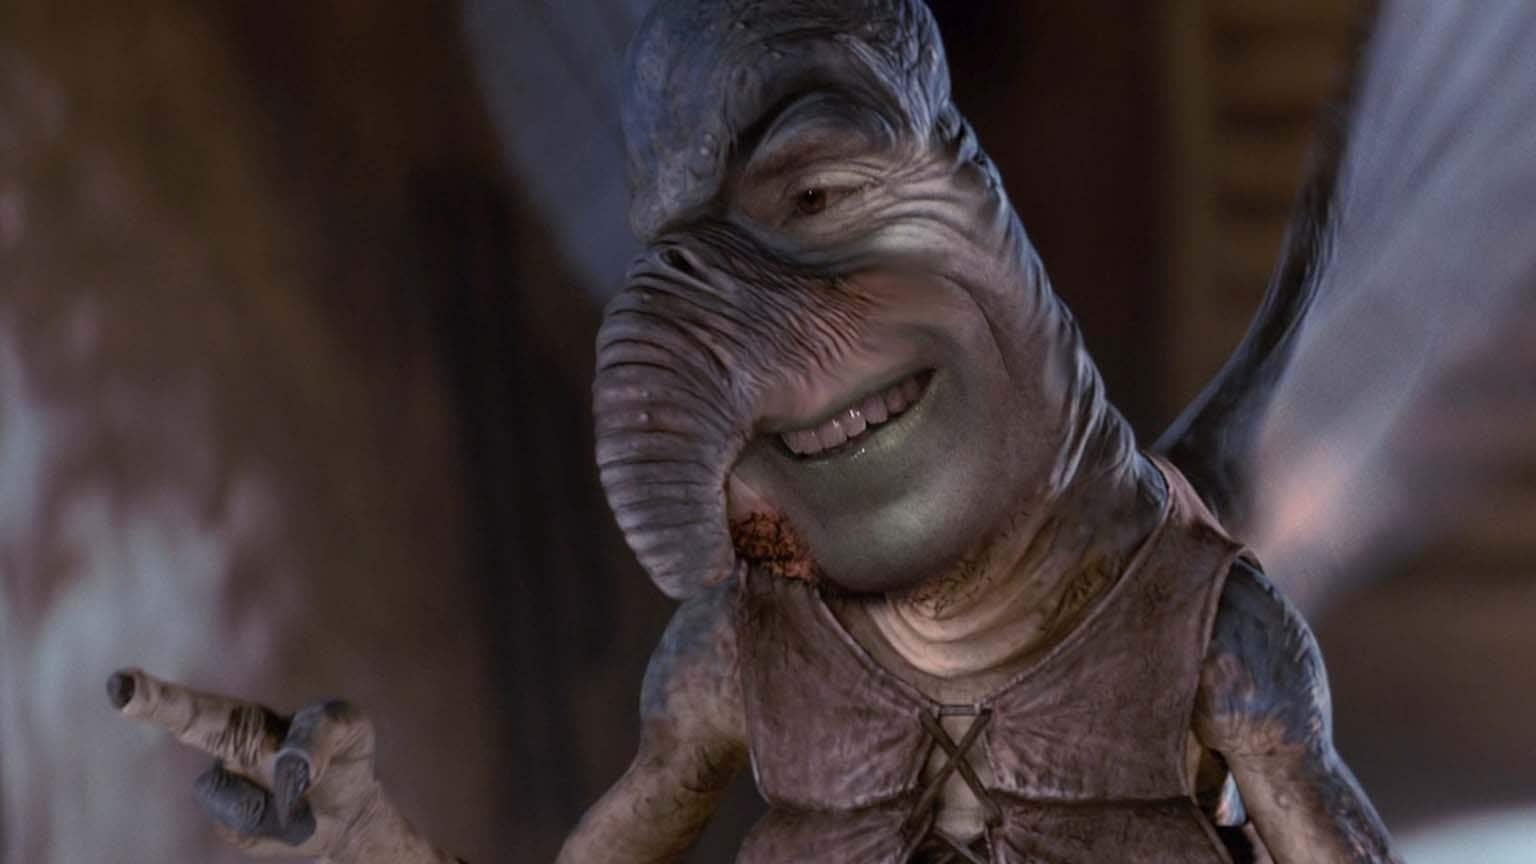 Jim Furyk as Watto